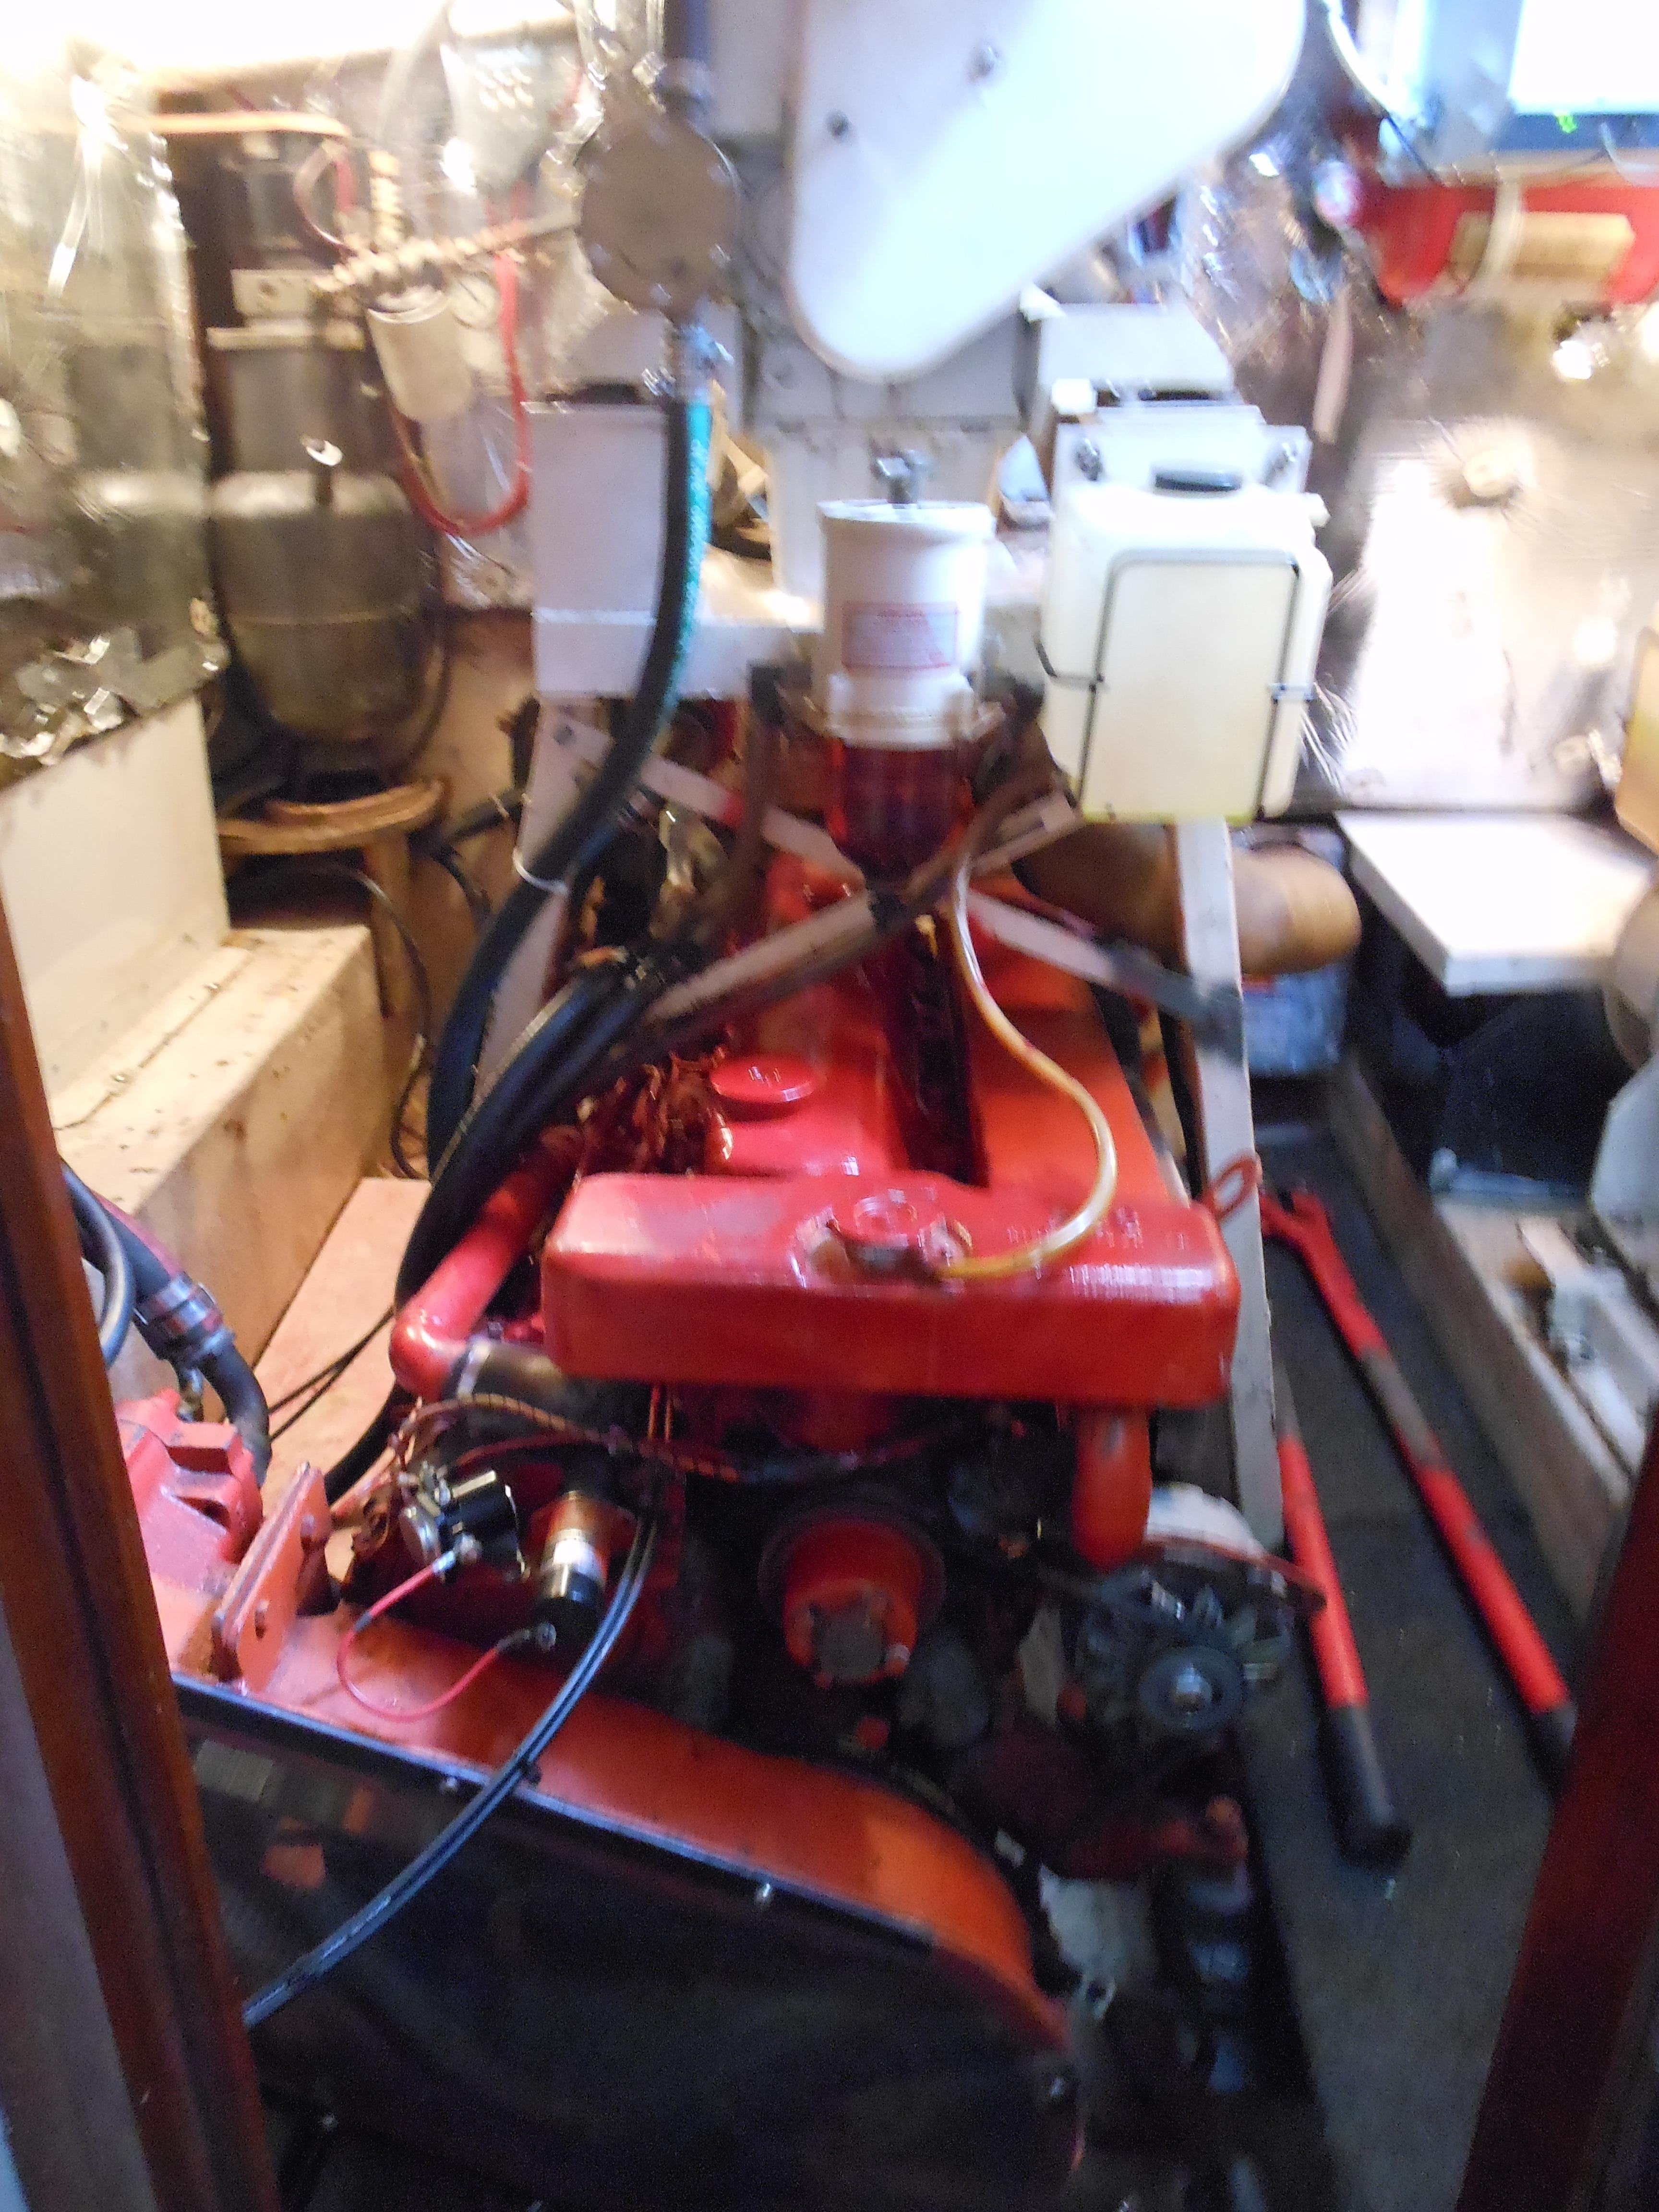 57 Wellington Main engine - 8KW generator above